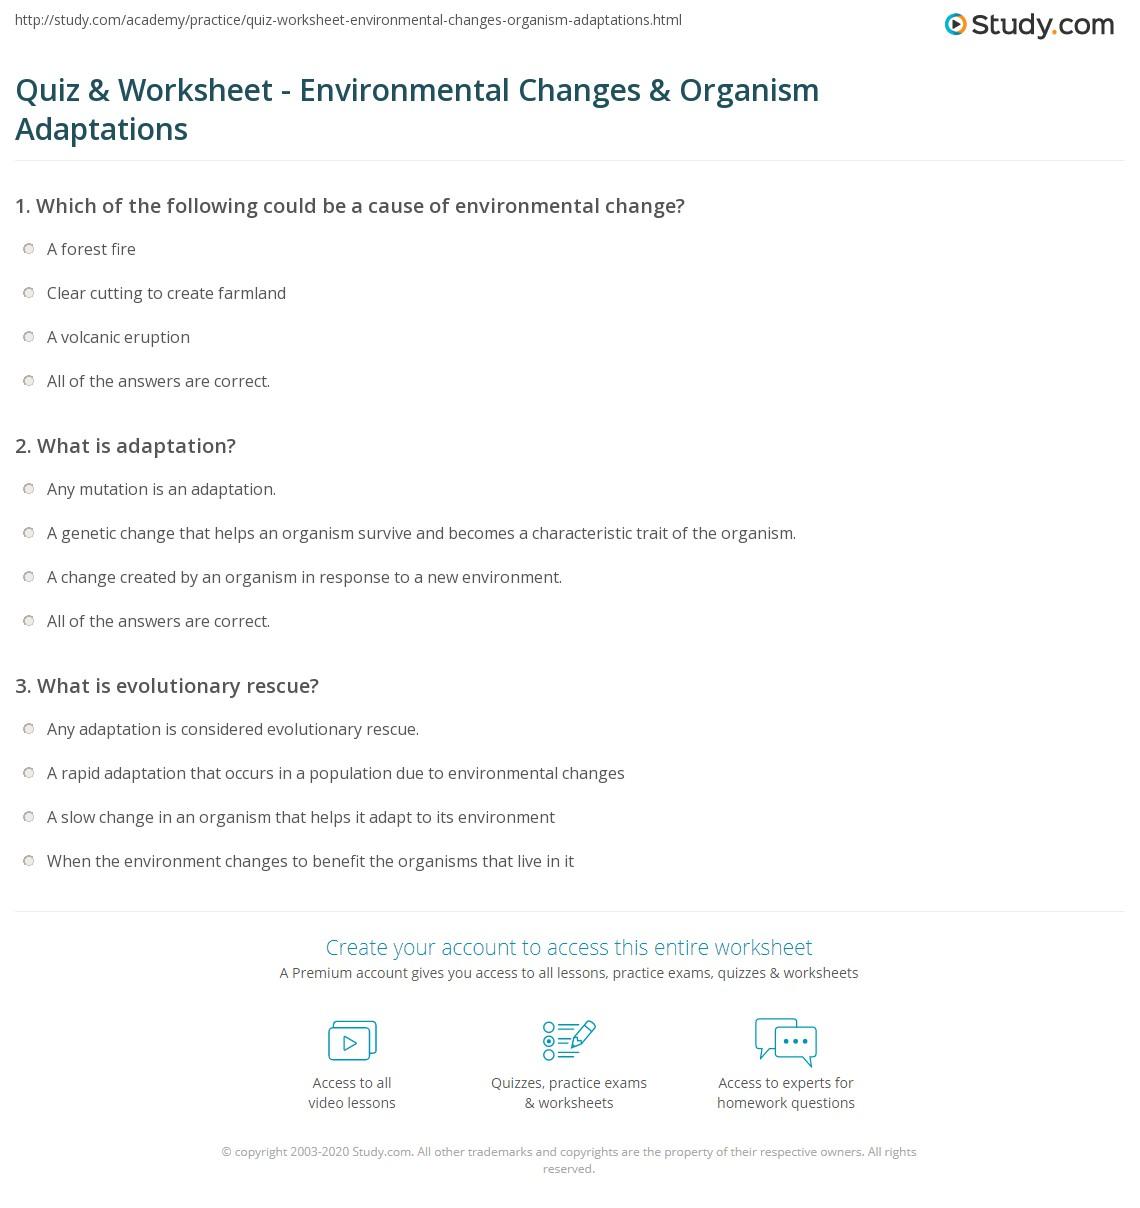 worksheet Genetic Mutations Worksheet genetic mutation worksheet answers abitlikethis quiz amp environmental changes amp